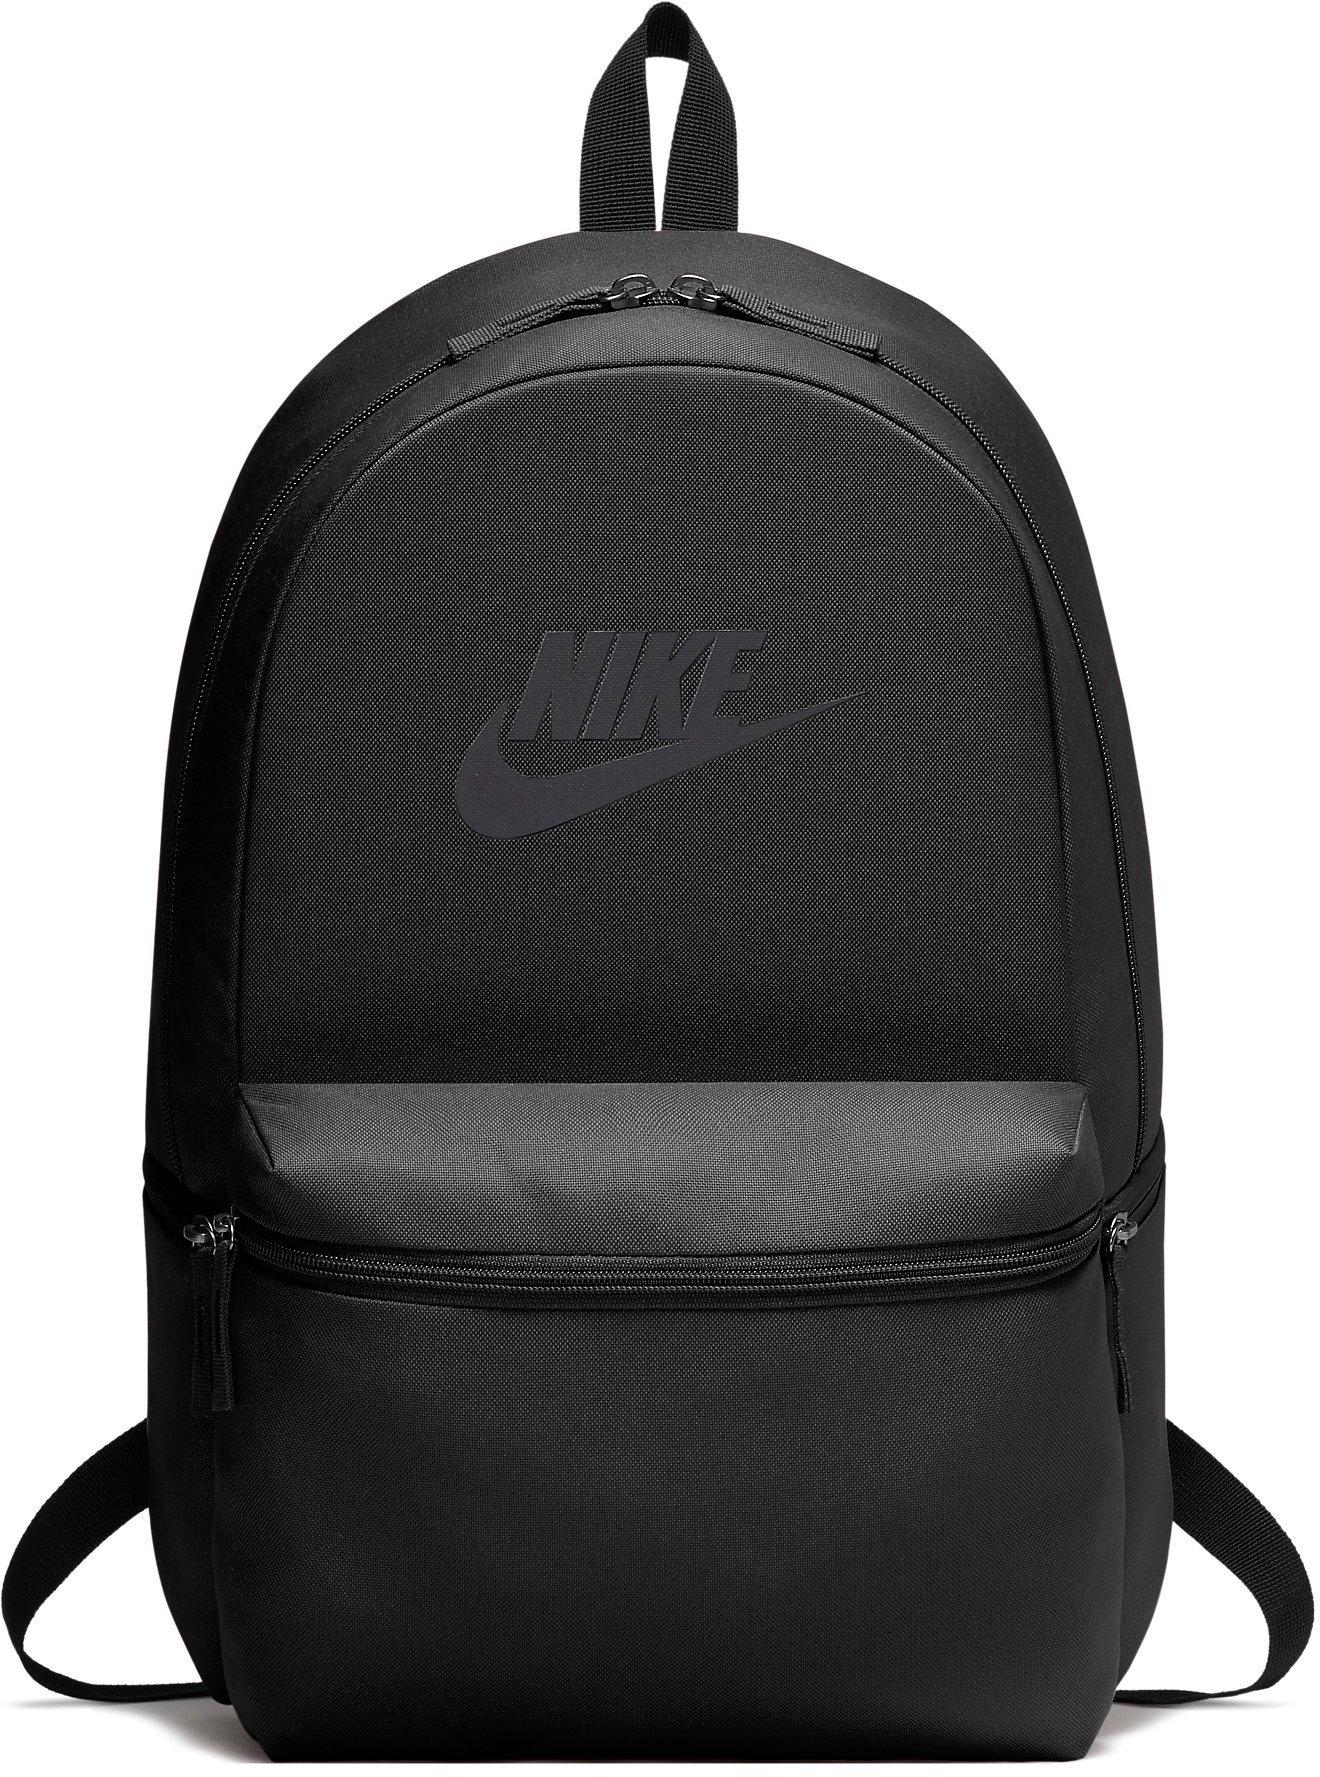 501c567908 Batoh Nike NK HERITAGE BKPK ba5749-010 - Glami.sk